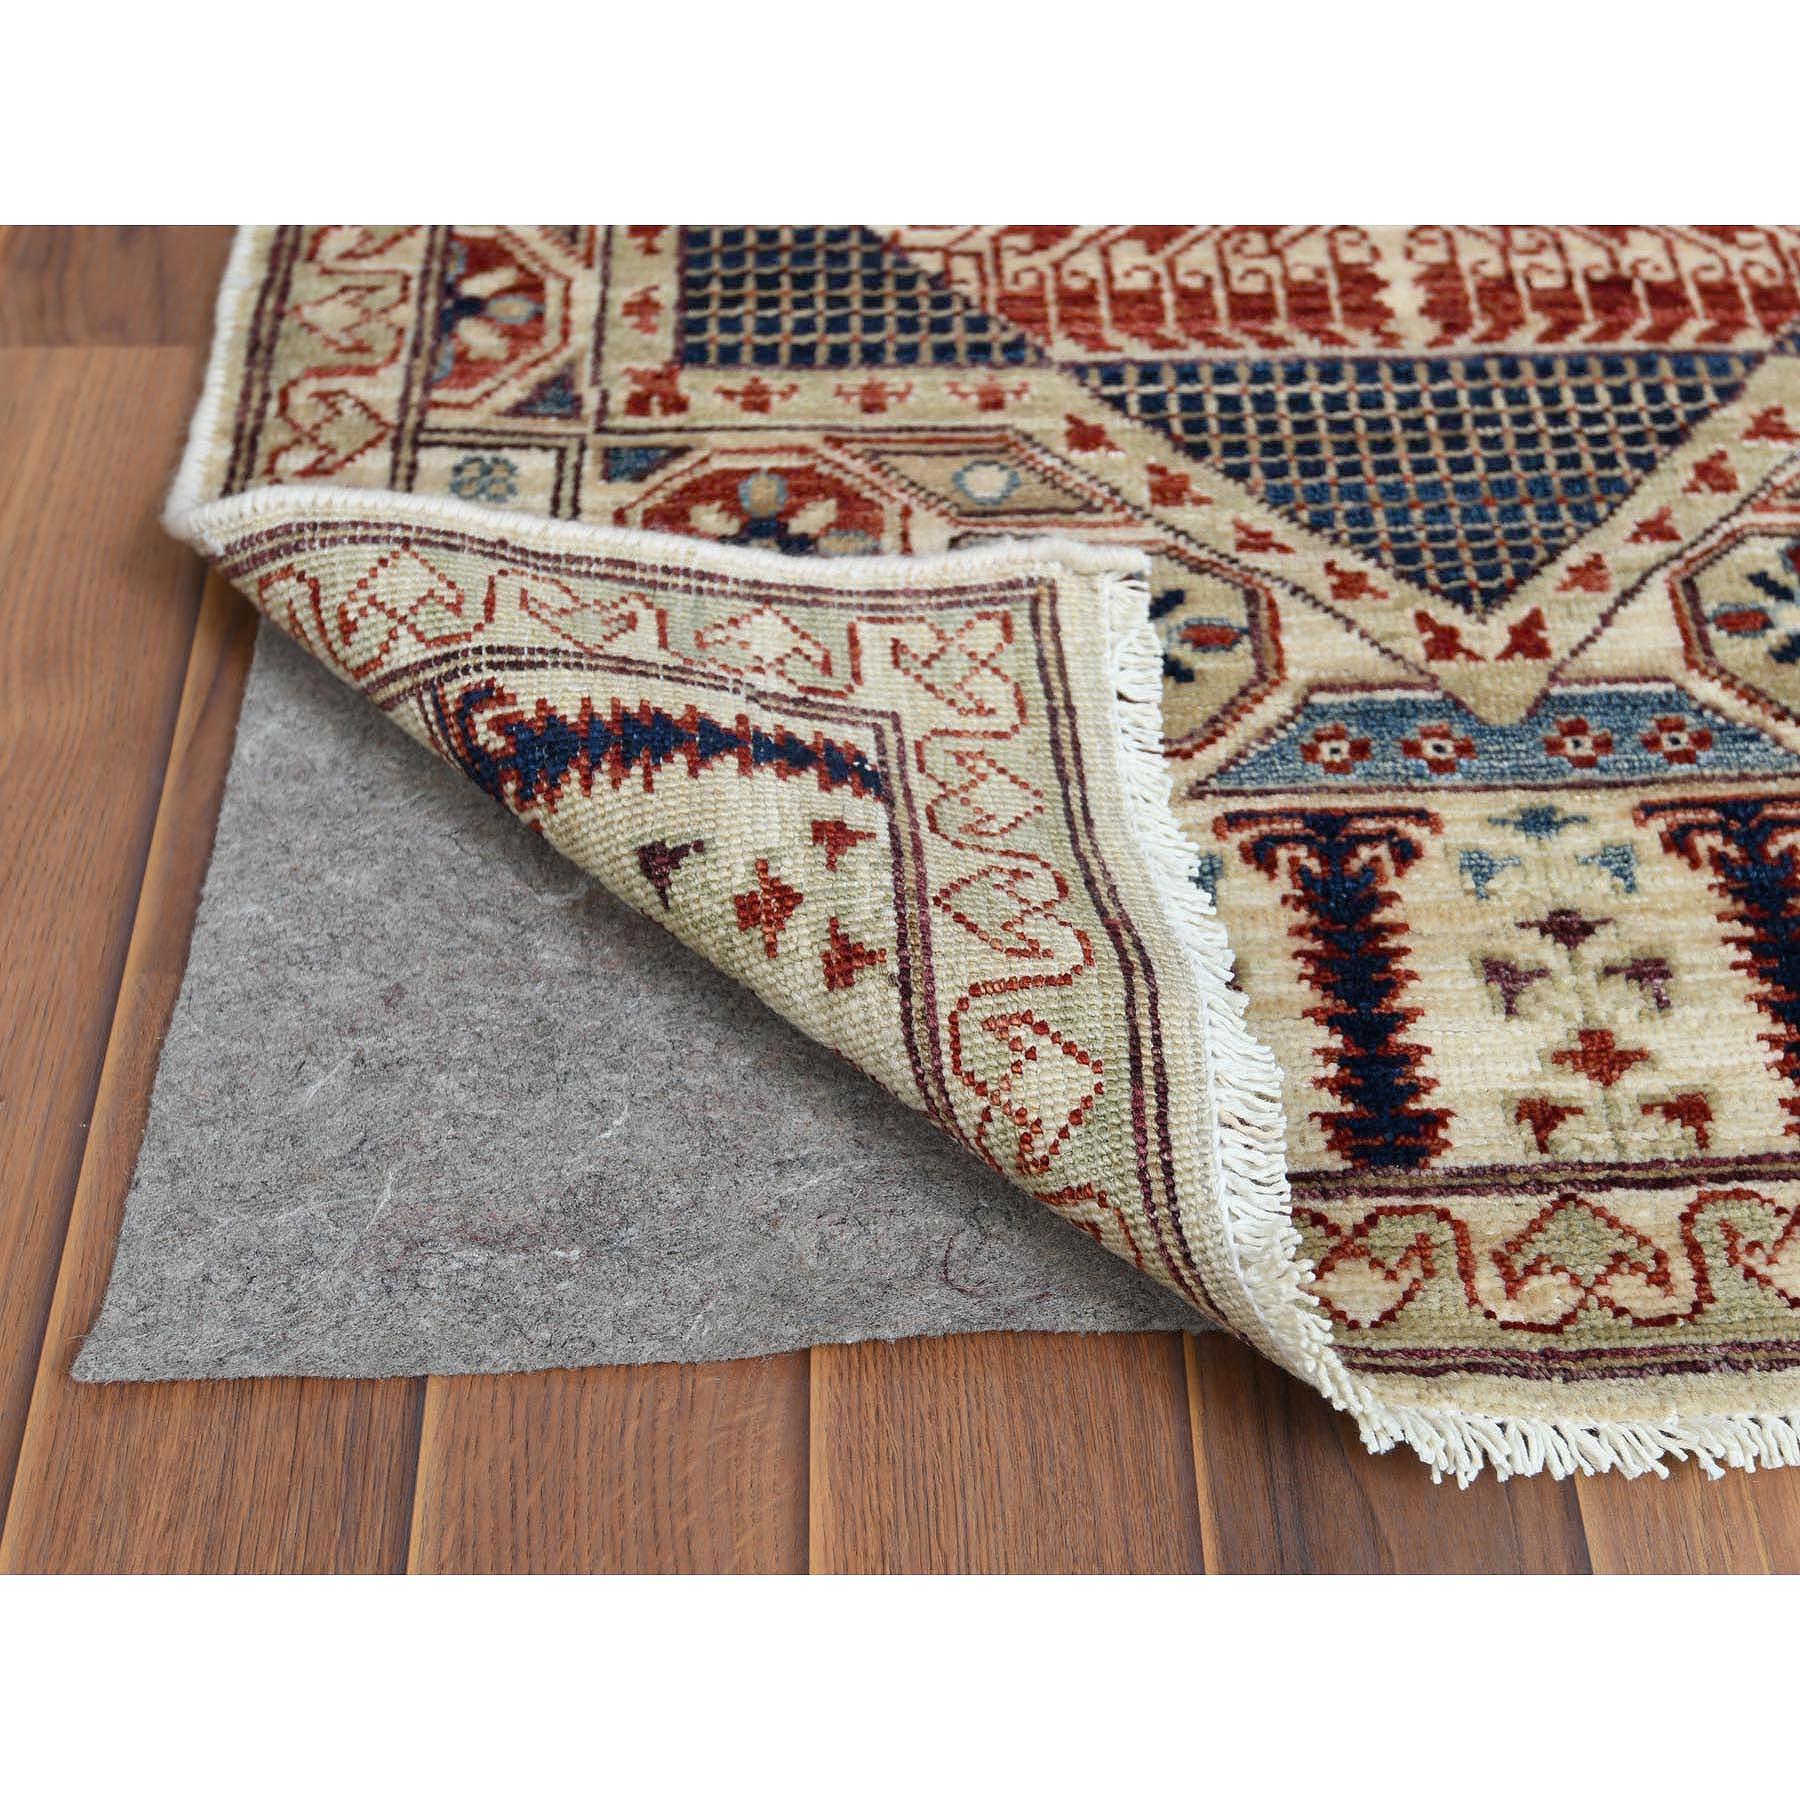 "2'7""x9'9"" Super Fine Peshawar Mamluk Design With Denser Weave Runner Shiny Wool Even Pile Hand Knotted Oriental Rug"